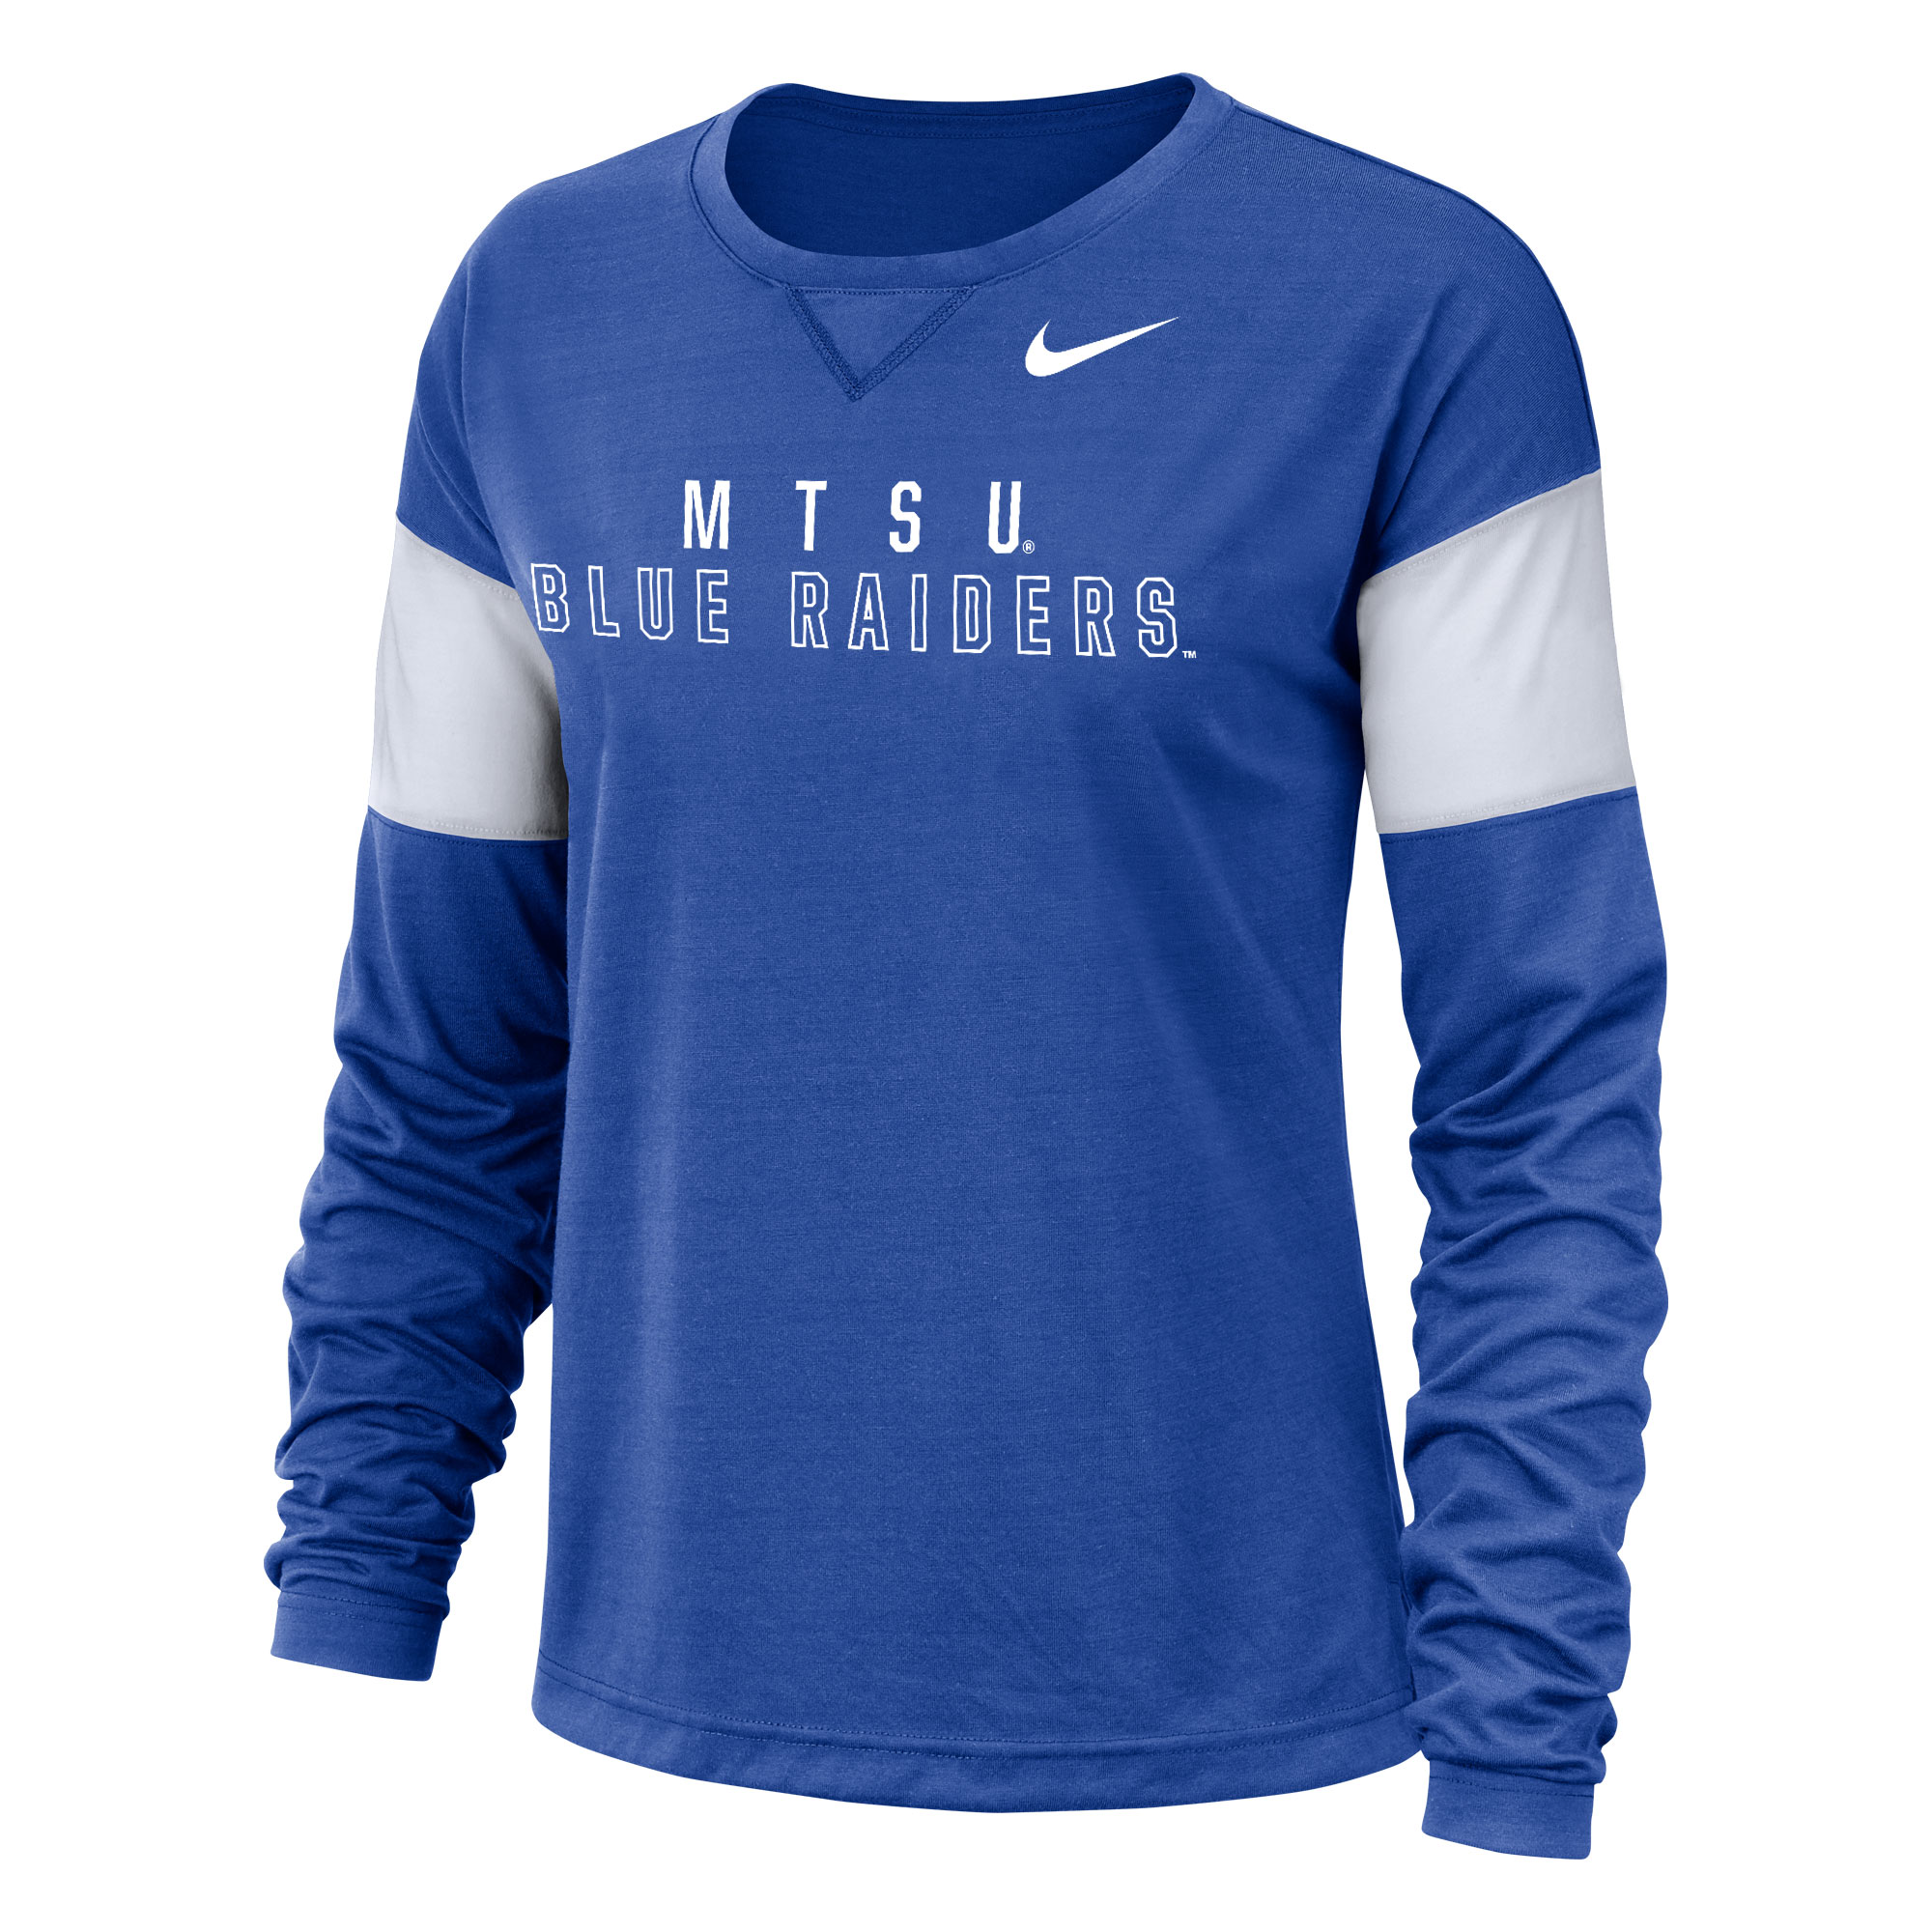 MTSU Blue Raiders Women's Nike® LS Breathe Top